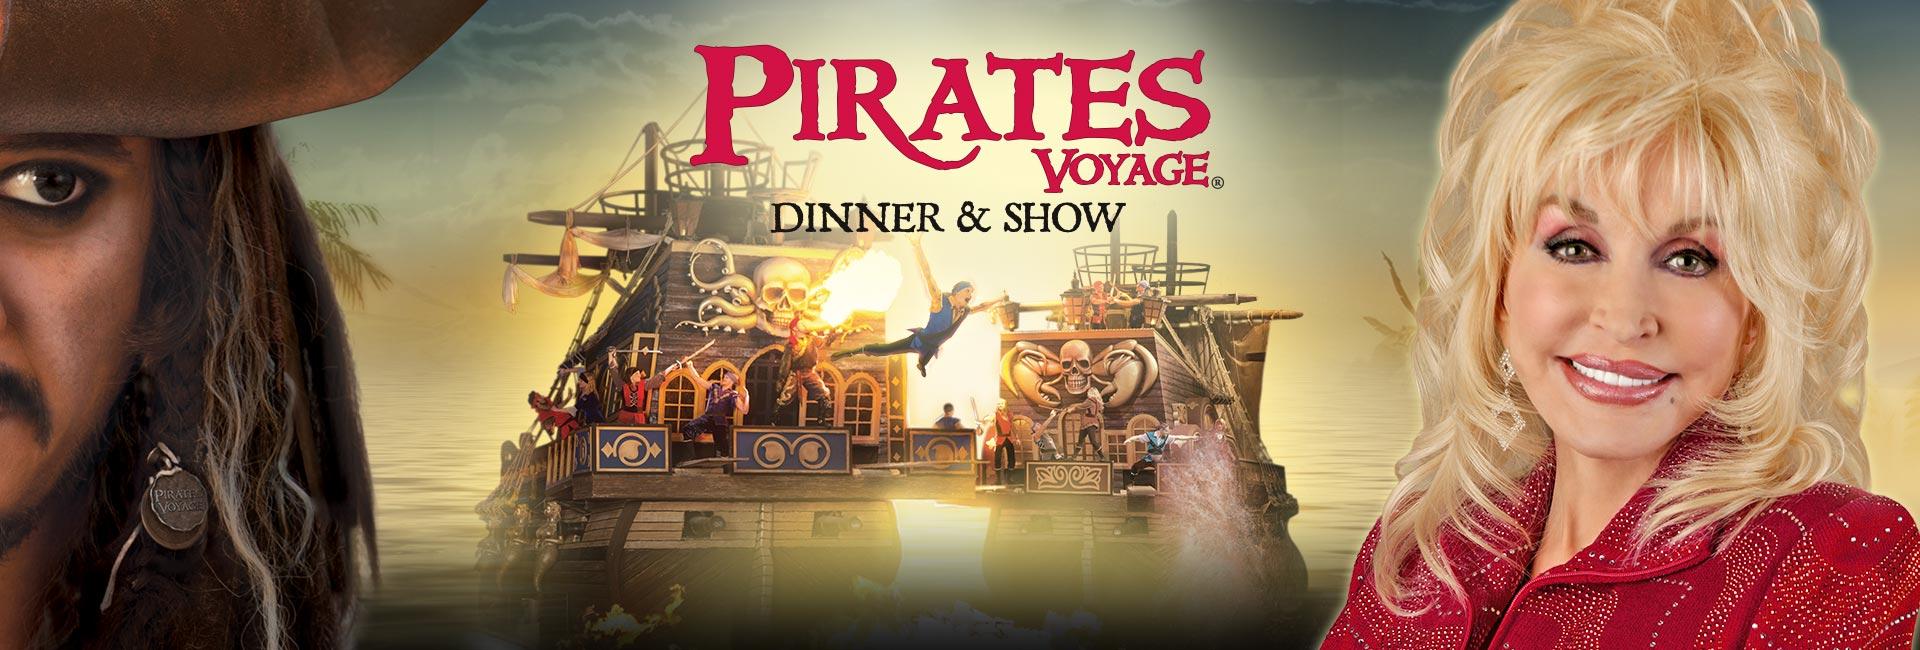 Pirates Voyage Dinner Amp Show